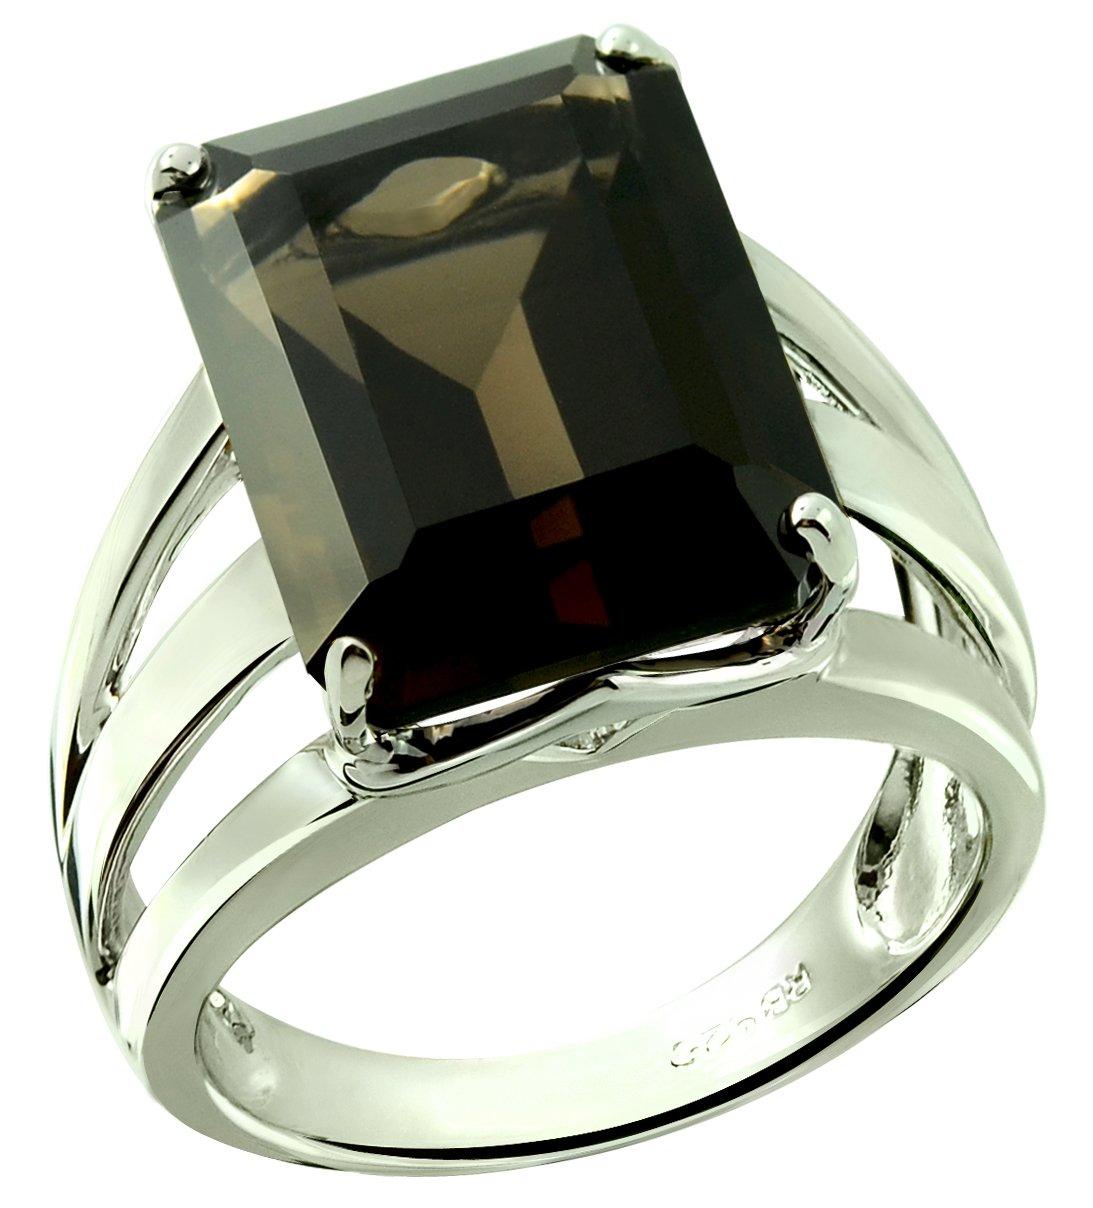 RB Gems Sterling Silver 925 Statement Ring Genuine Gemstone Octagon 16x12 mm with Rhodium-Plated Finish (8, Smoky-Quartz)